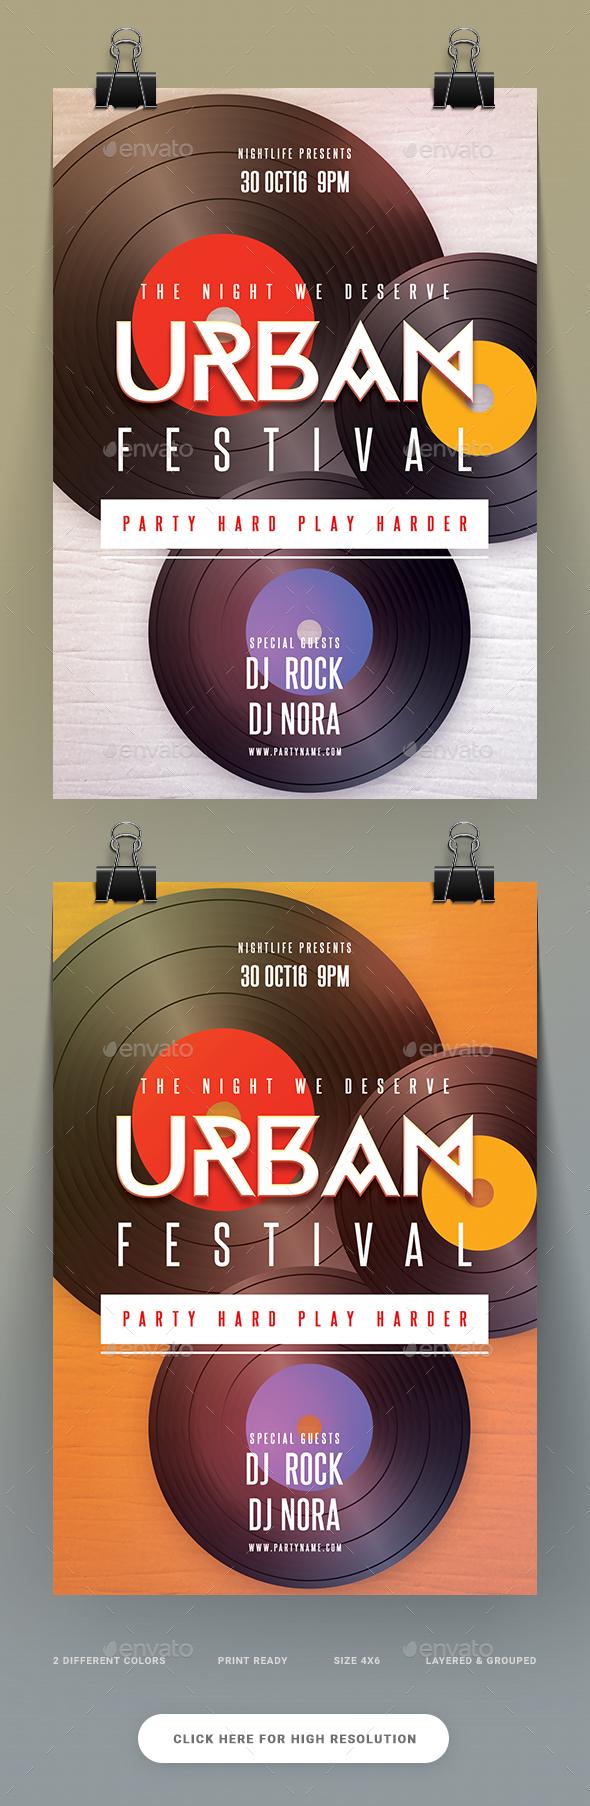 Urban Festival Flyer